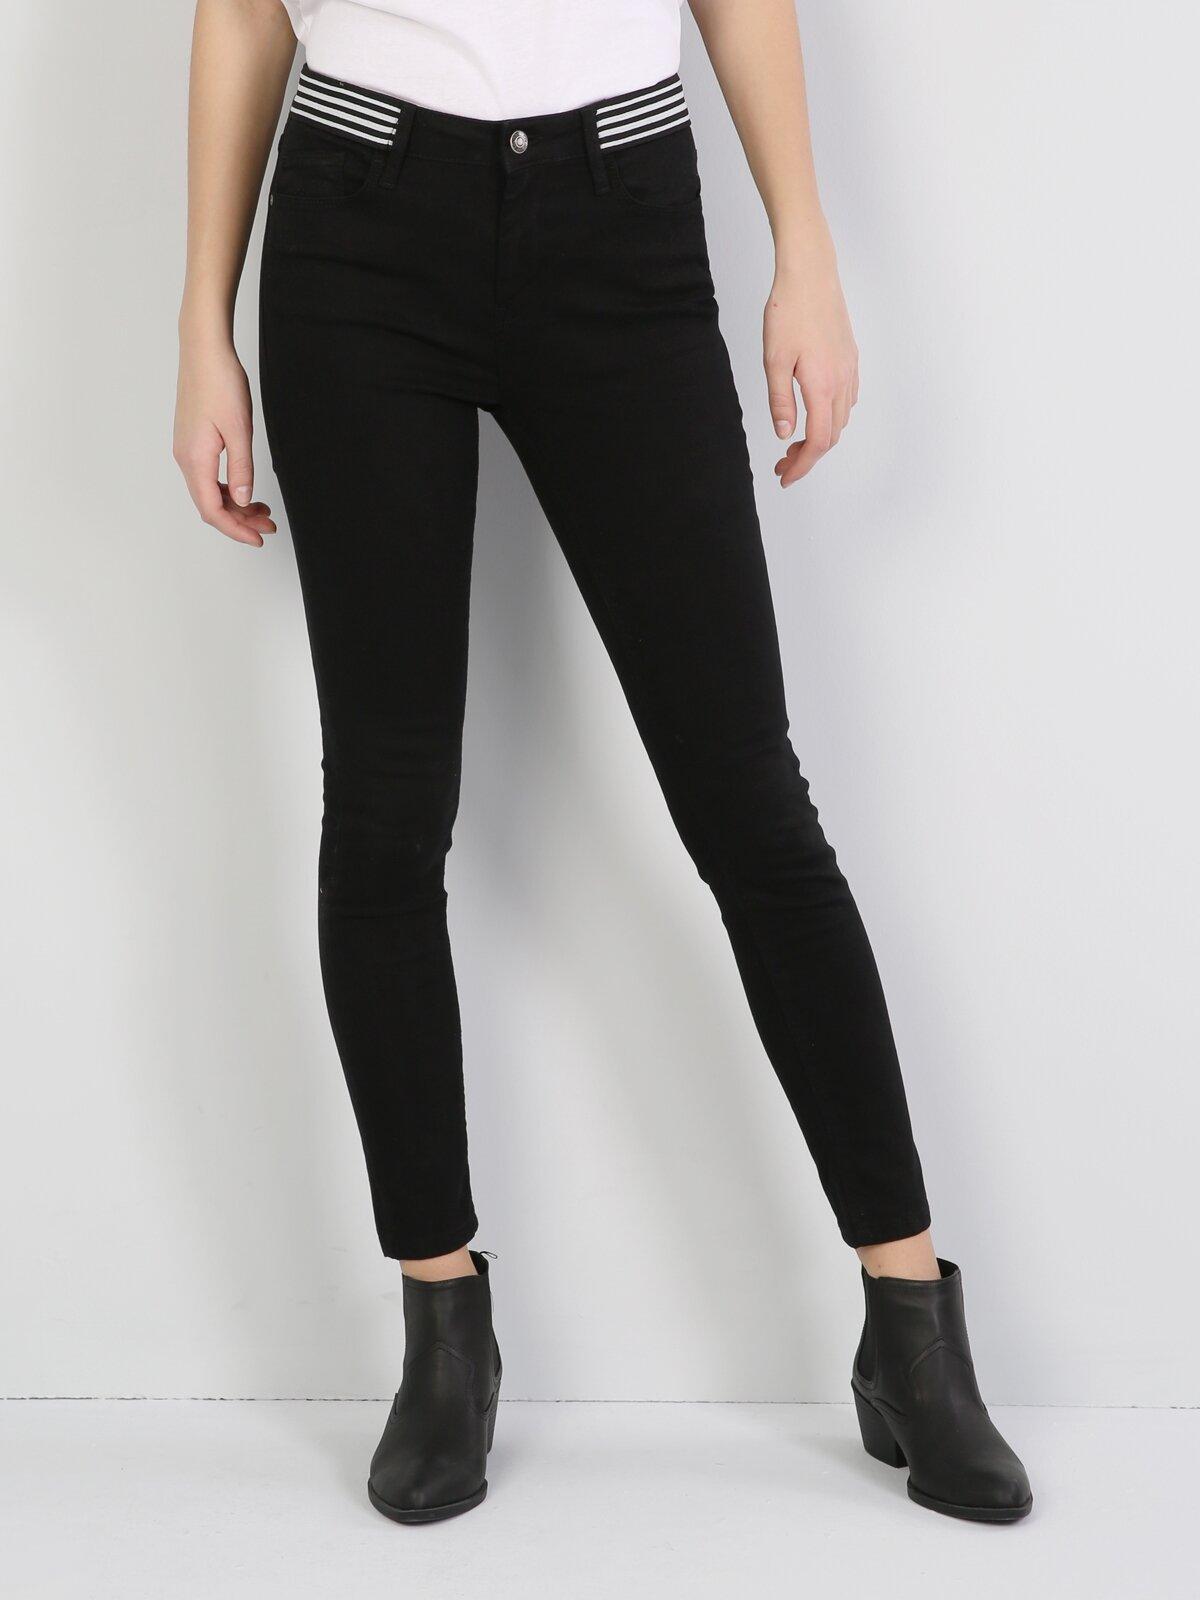 Super Slim Fit Orta Bel Skinny  Leg  Kadın Siyah Pantolon